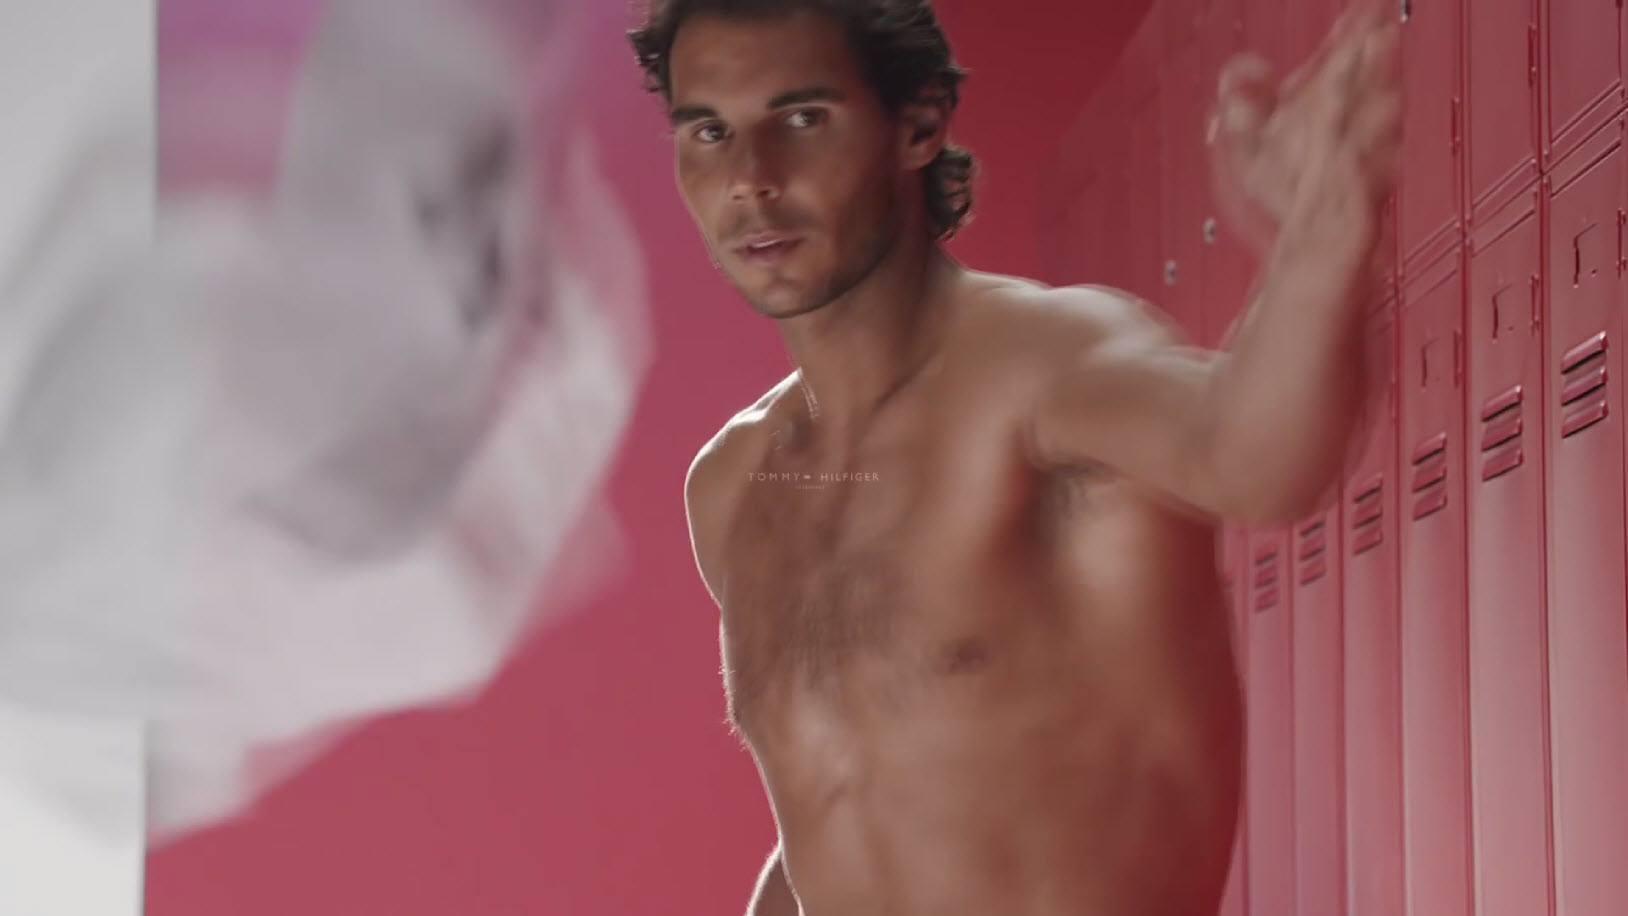 rafael nadal tossing underwear 2015